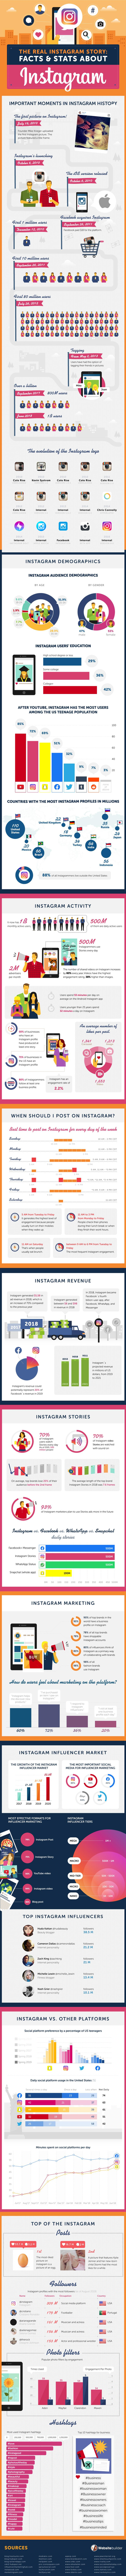 Instagram Statistics Infographic